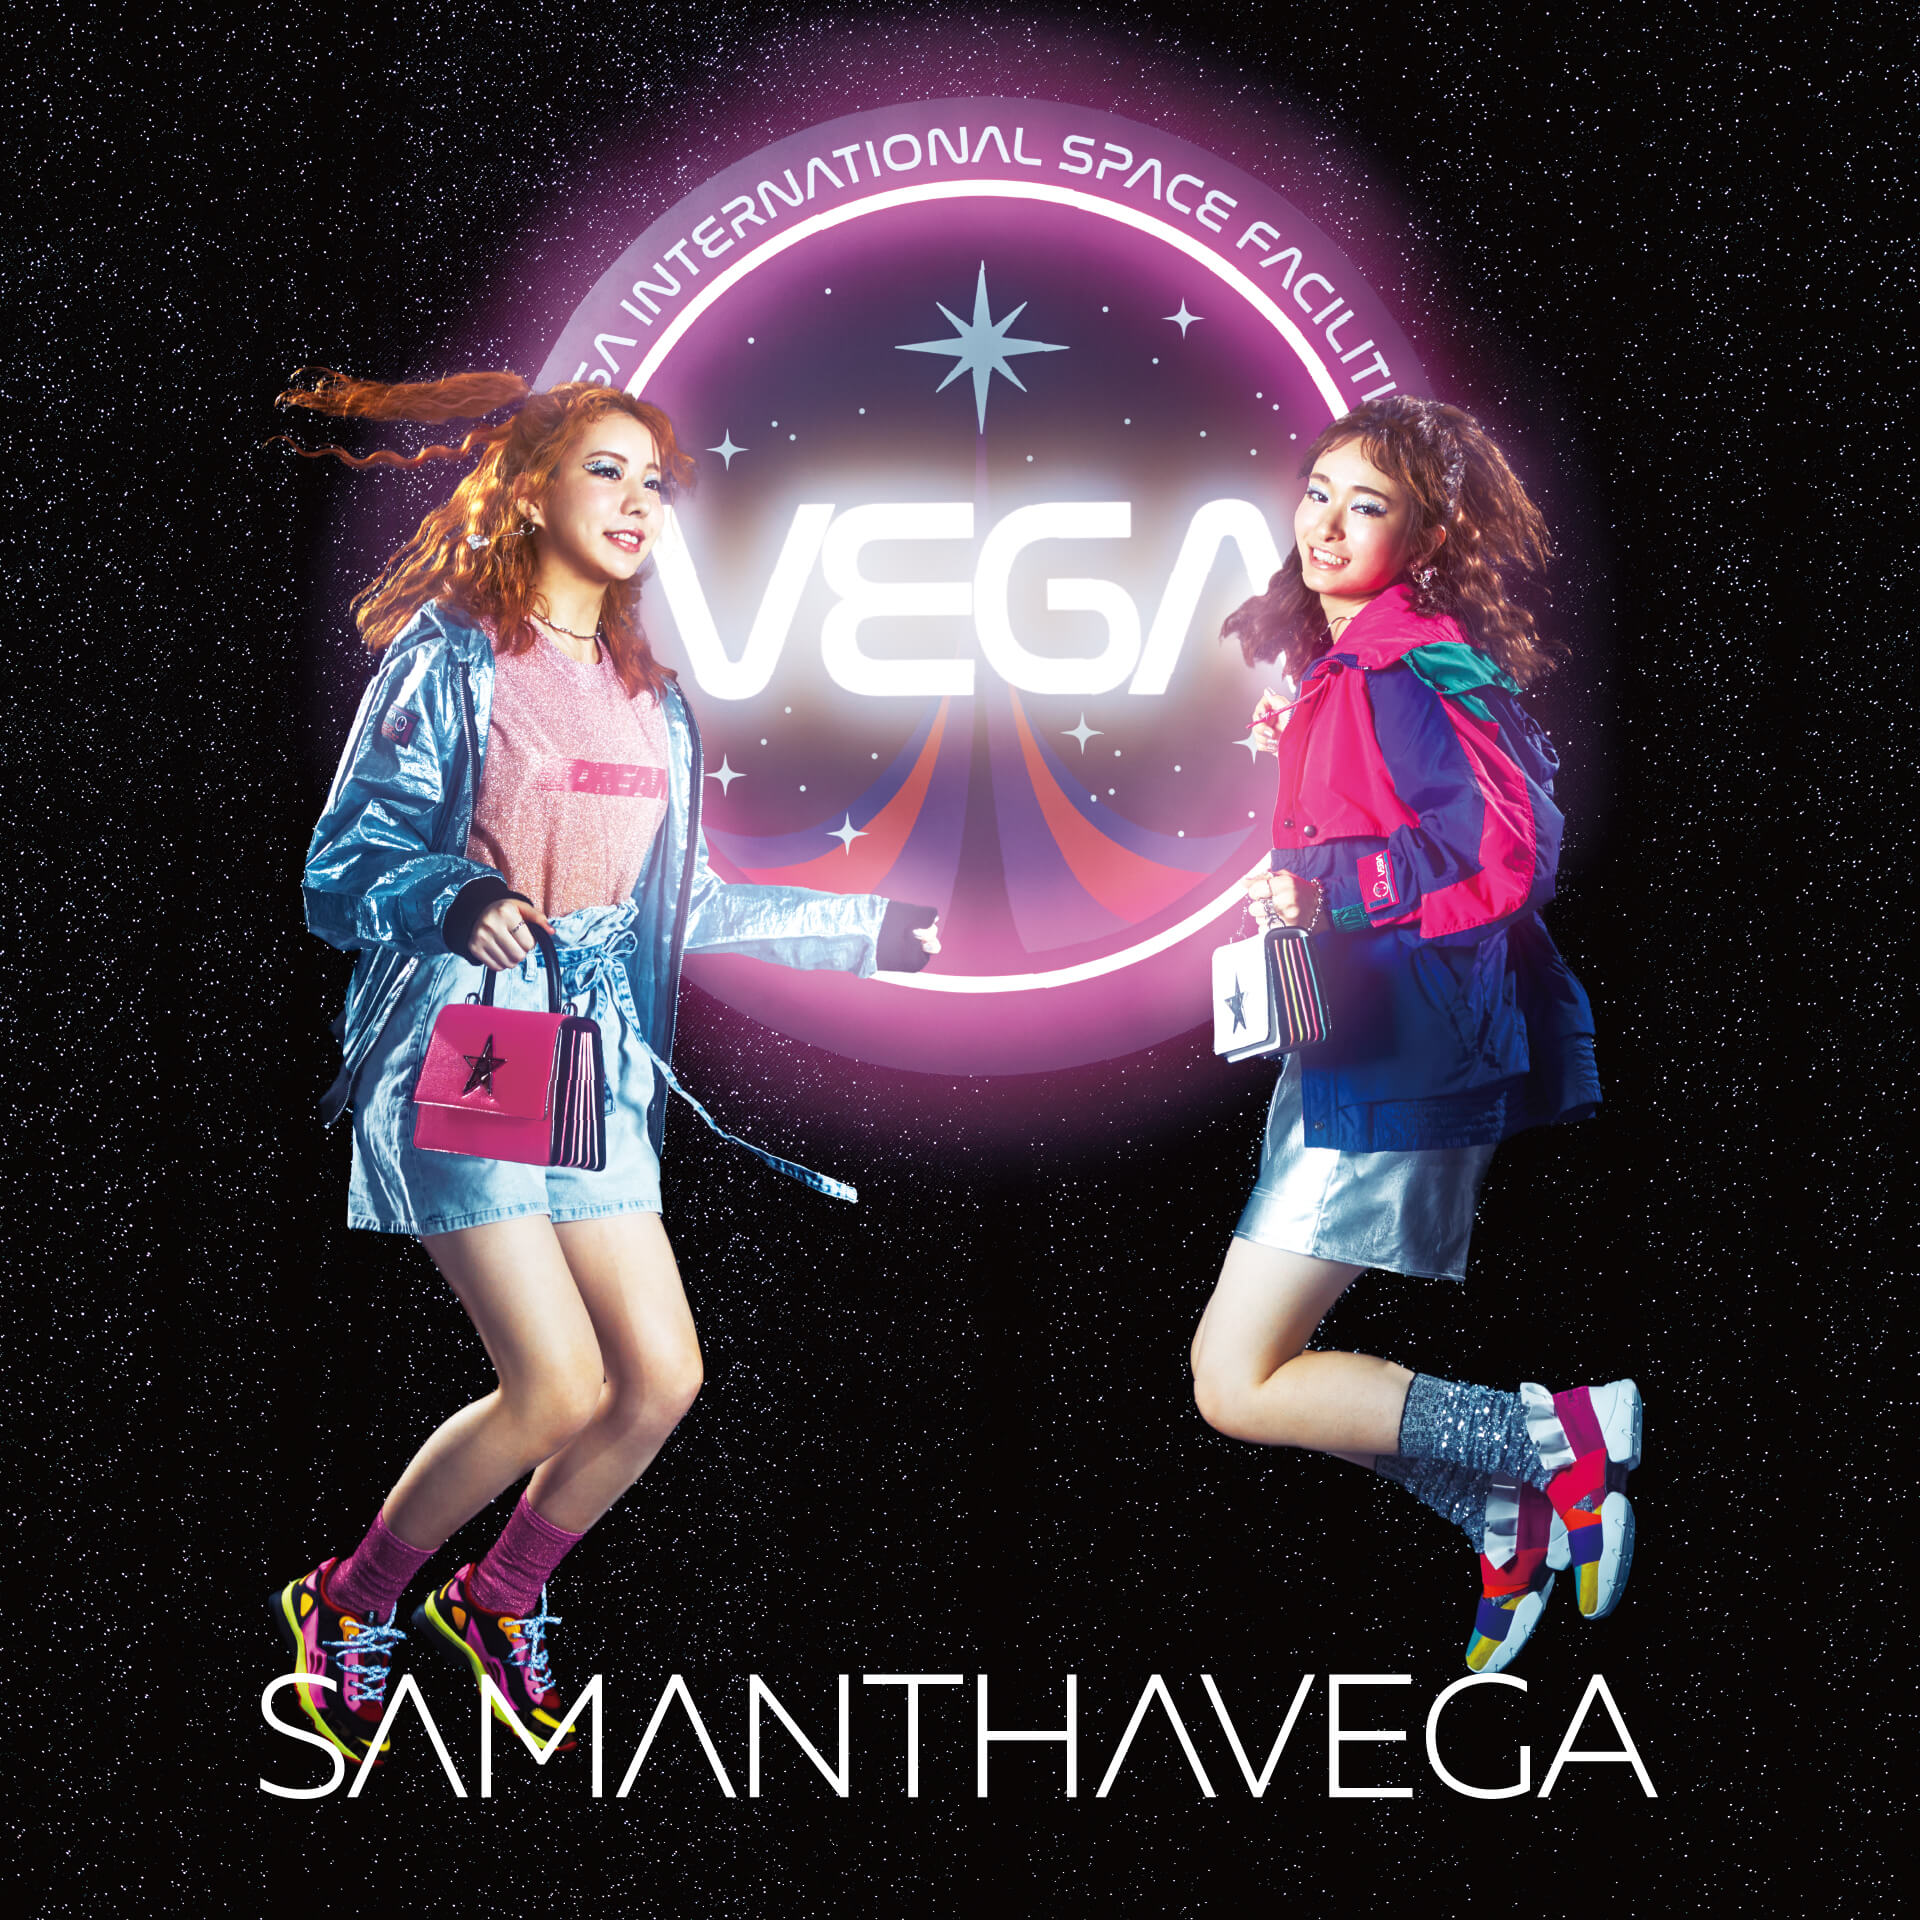 SAMANTHAVEGA -VEGA INTERNATIONAL SPACE FACILITIES-